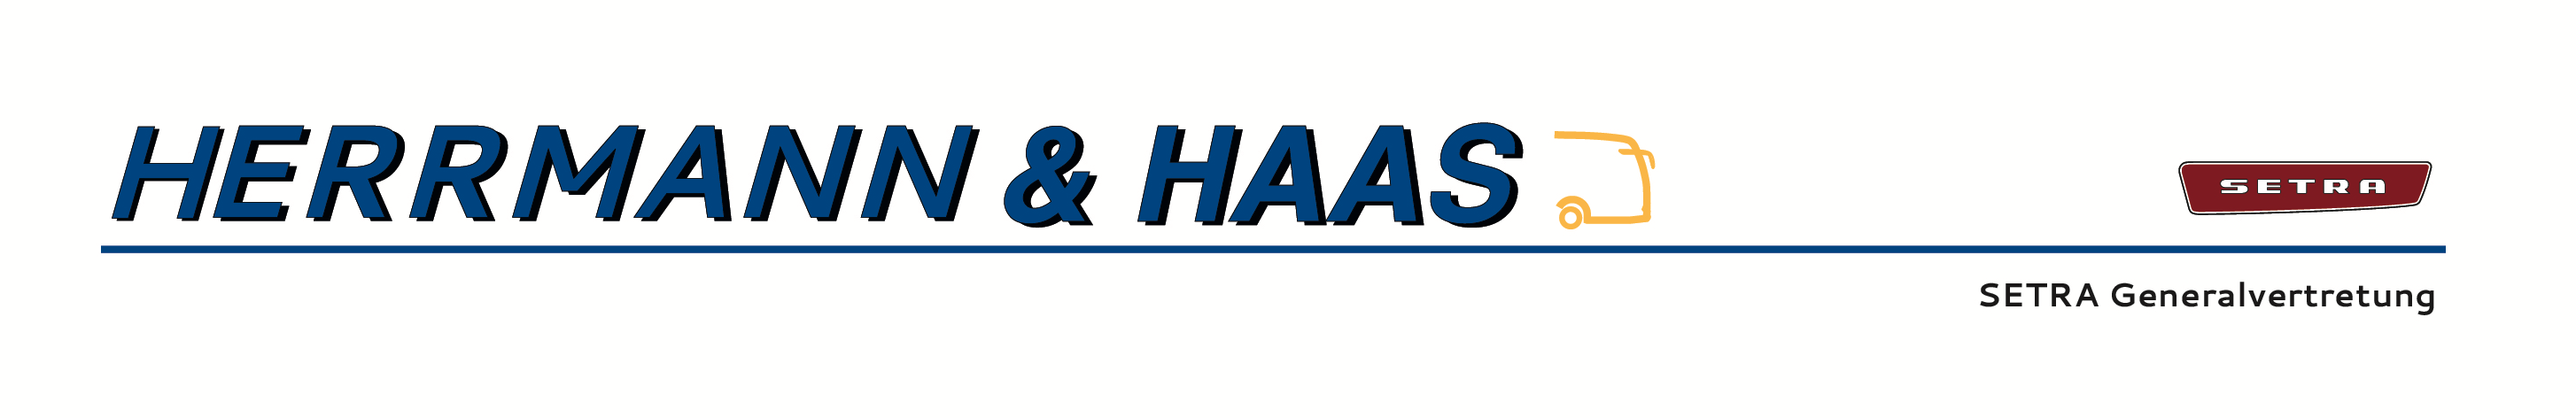 Herrmann & Haas GmbH  Logo